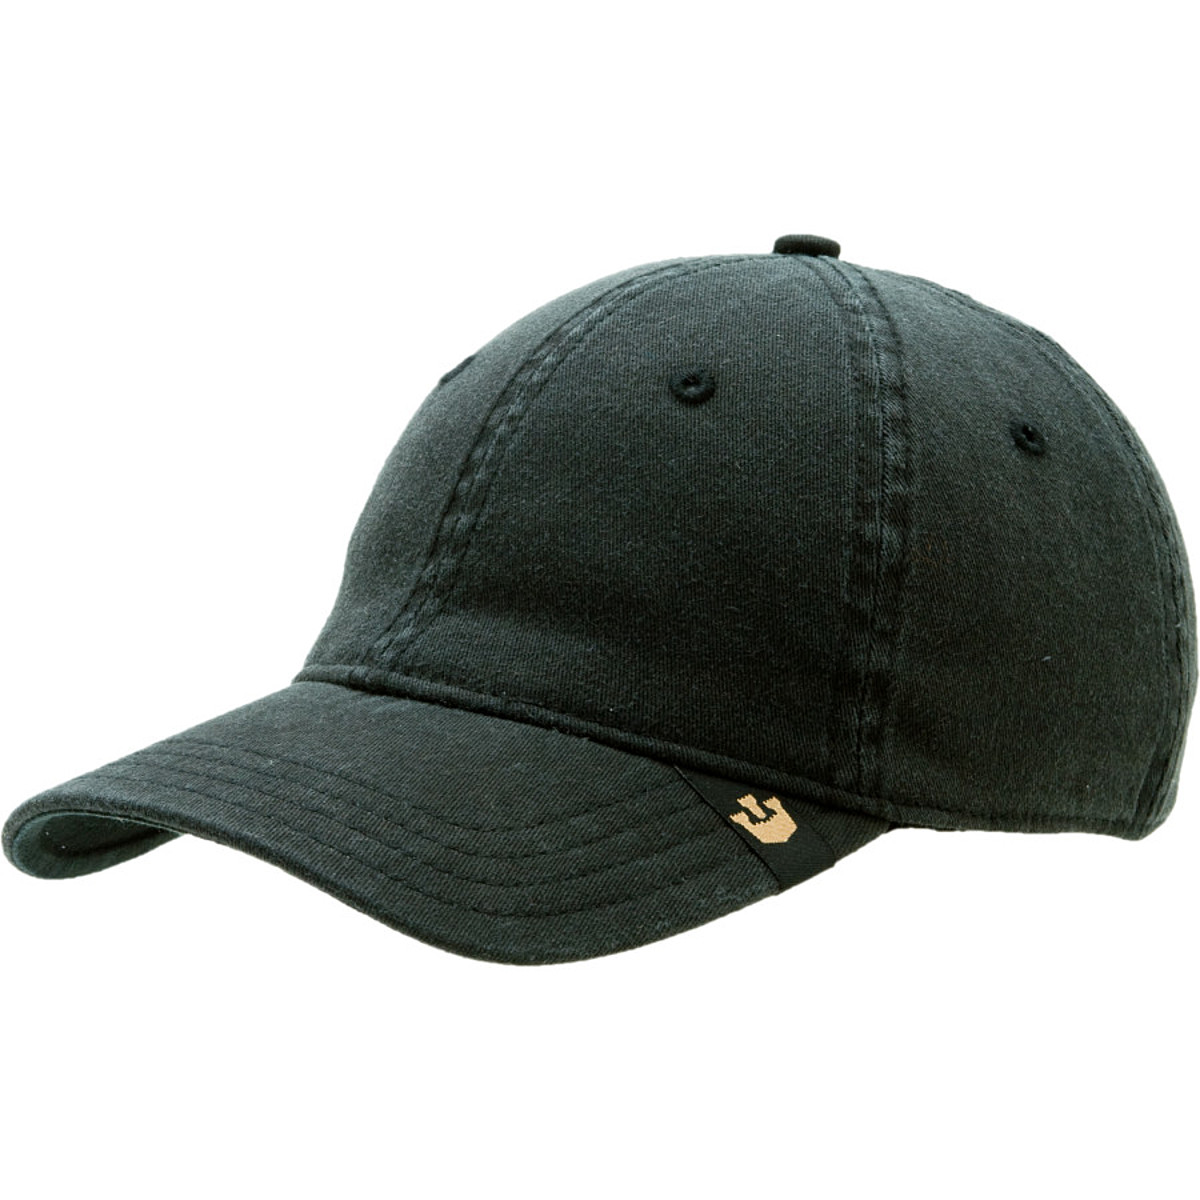 5b25cdf0 Goorin Brothers Slayer Baseball Hat Black S